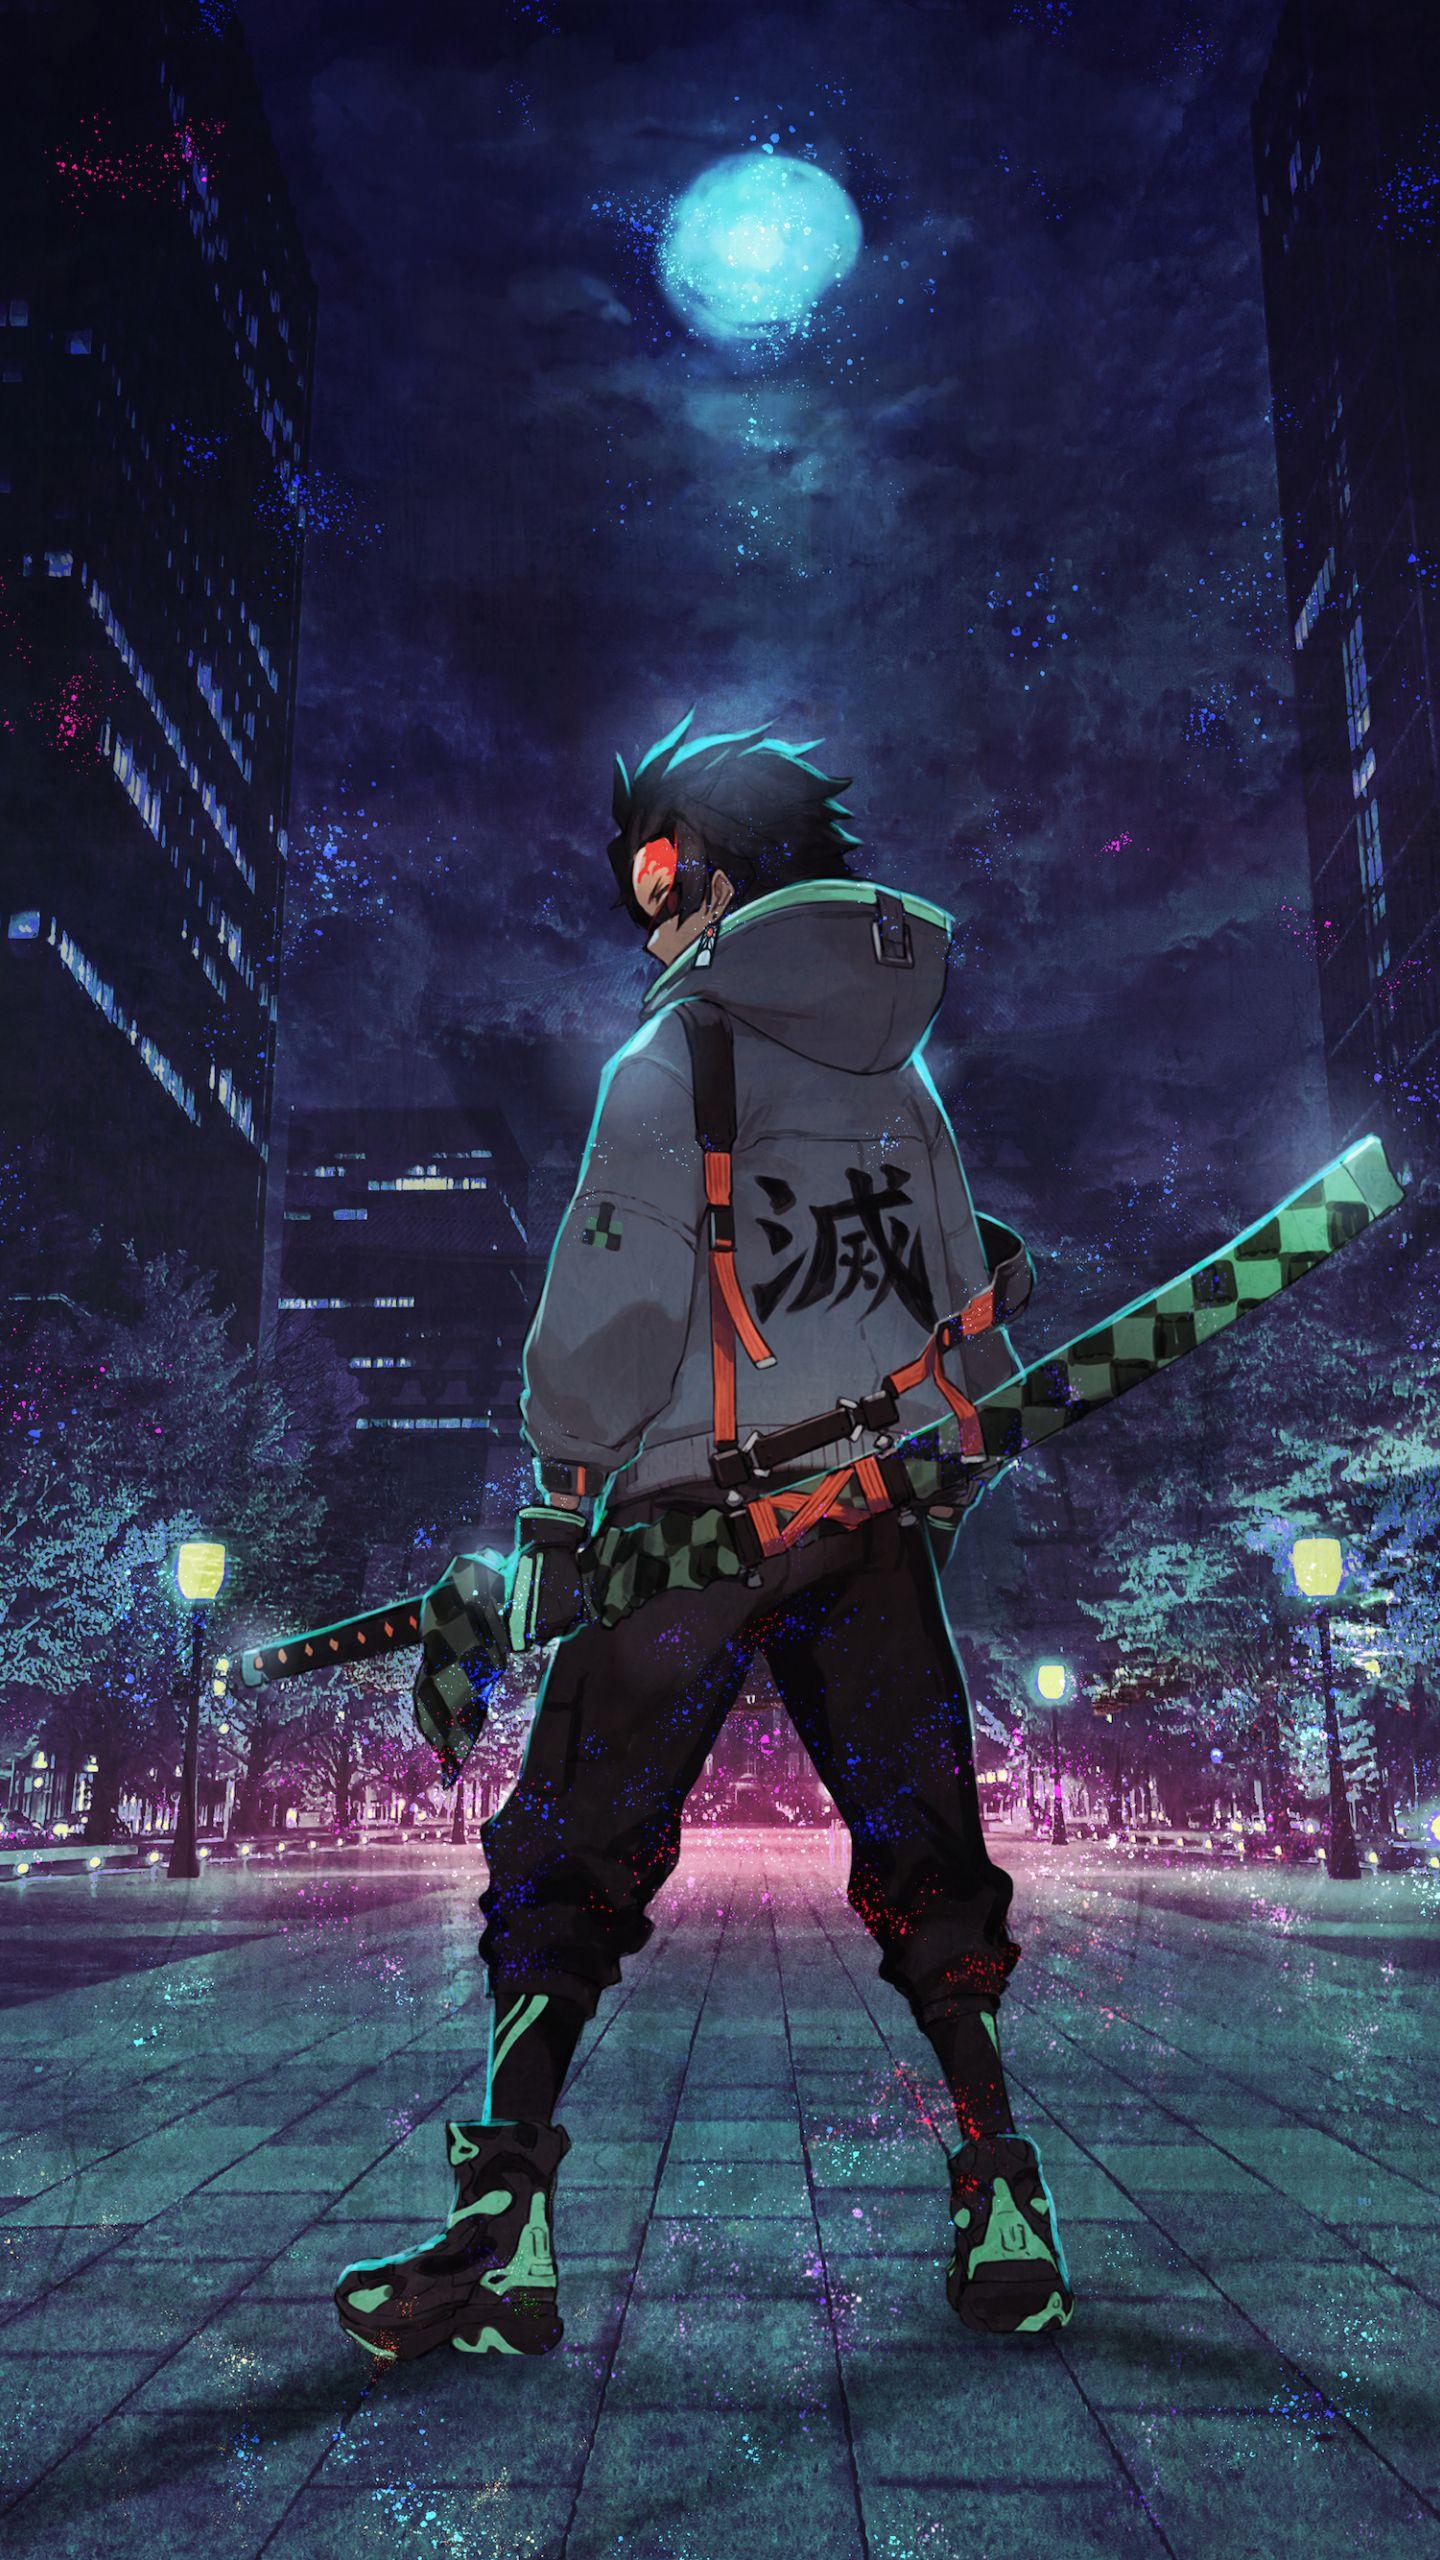 1440x2560 Urban ninja anime art wallpaper Anime wallpaper live 1440x2560